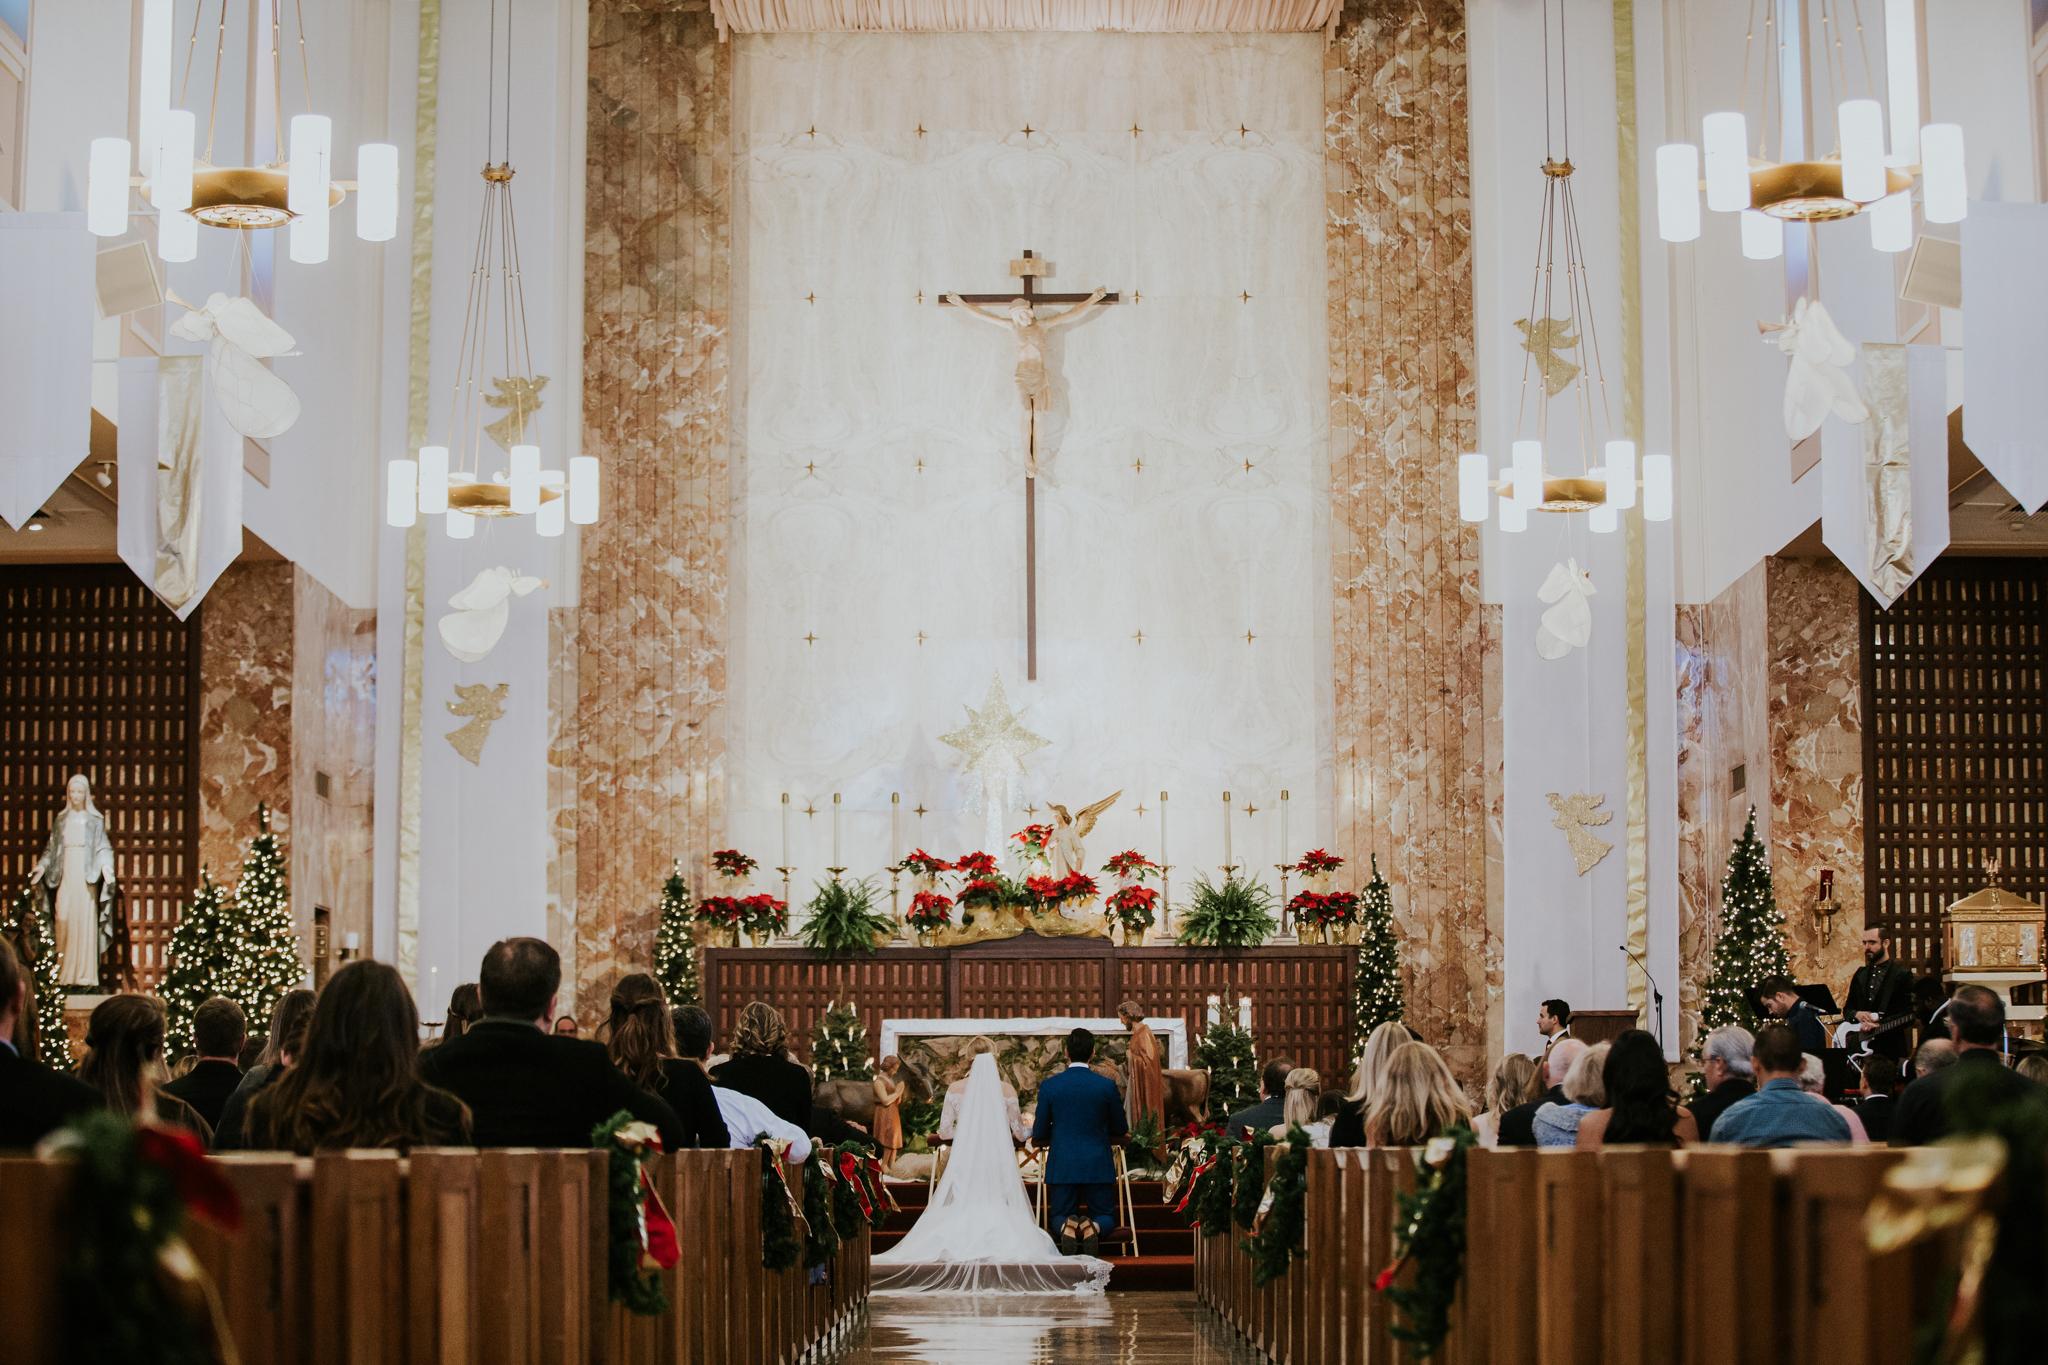 20151230_hussem_wedding_0561_web.jpg